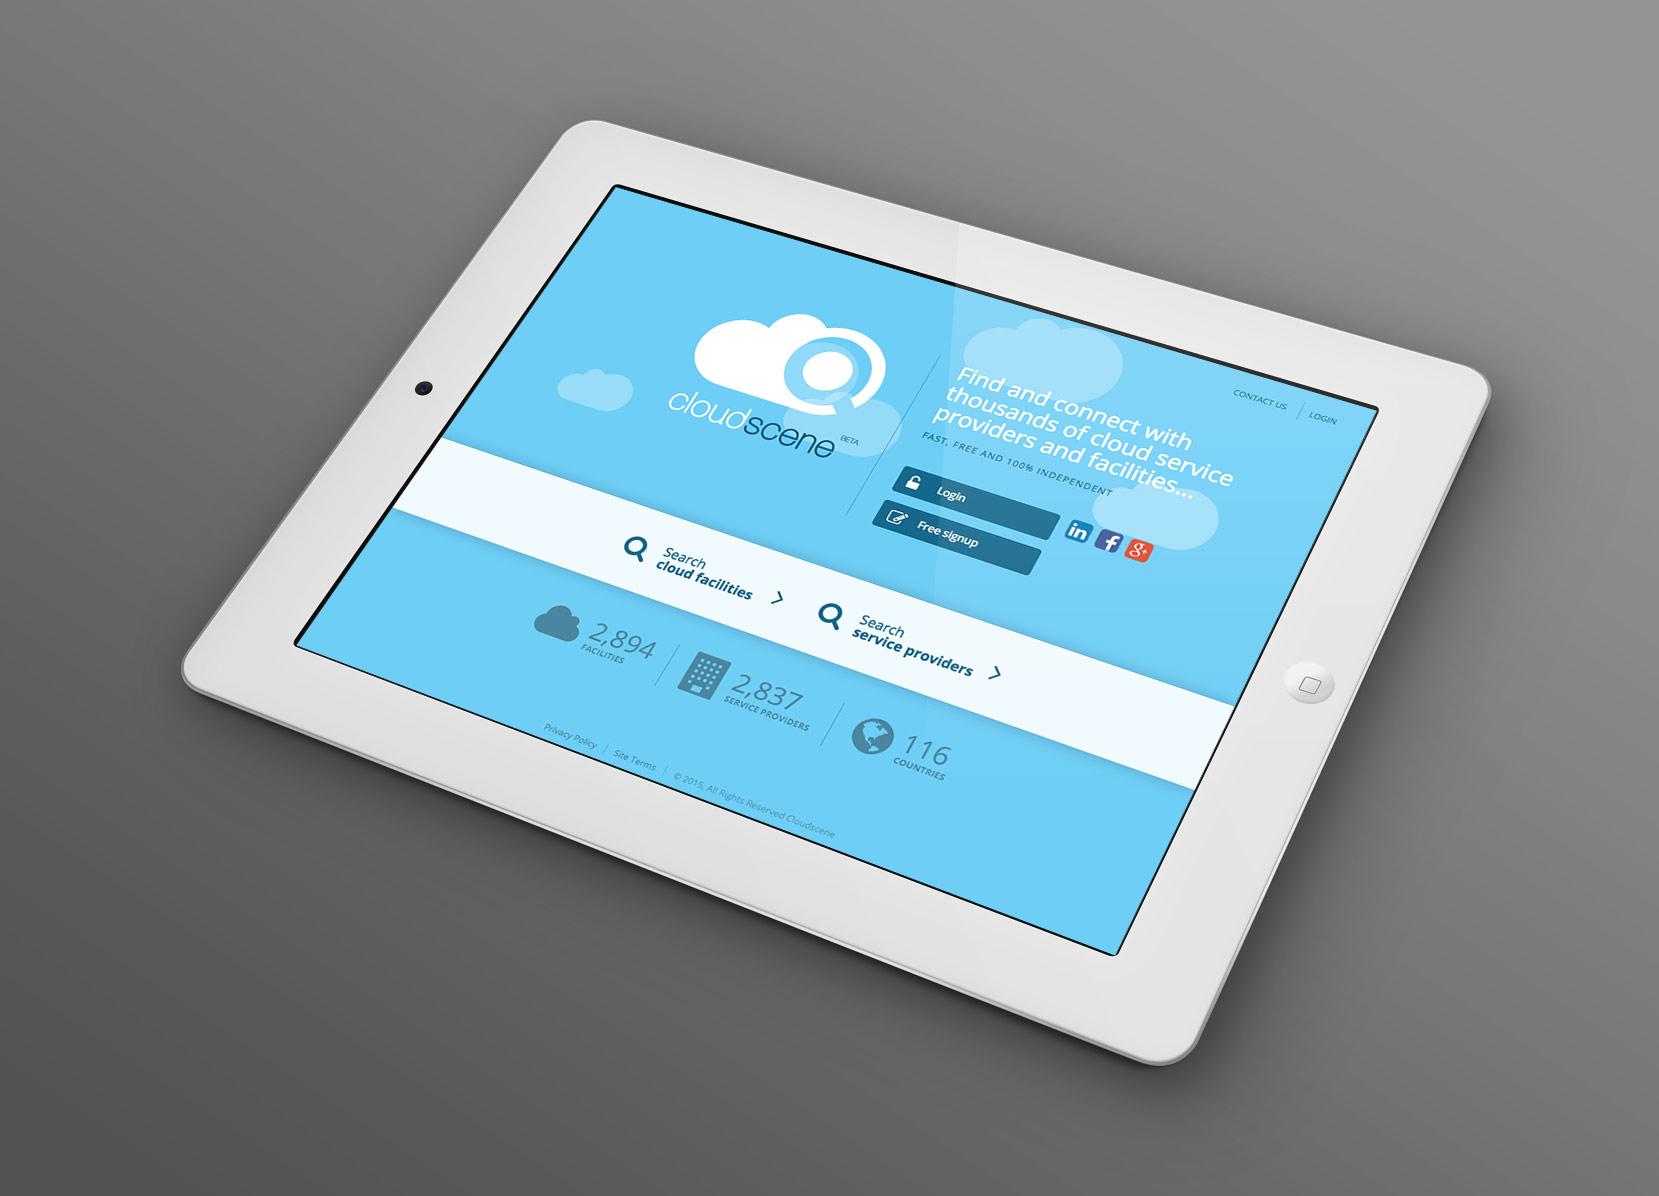 2015-03-Cloudscene-ipad-mockup.jpg